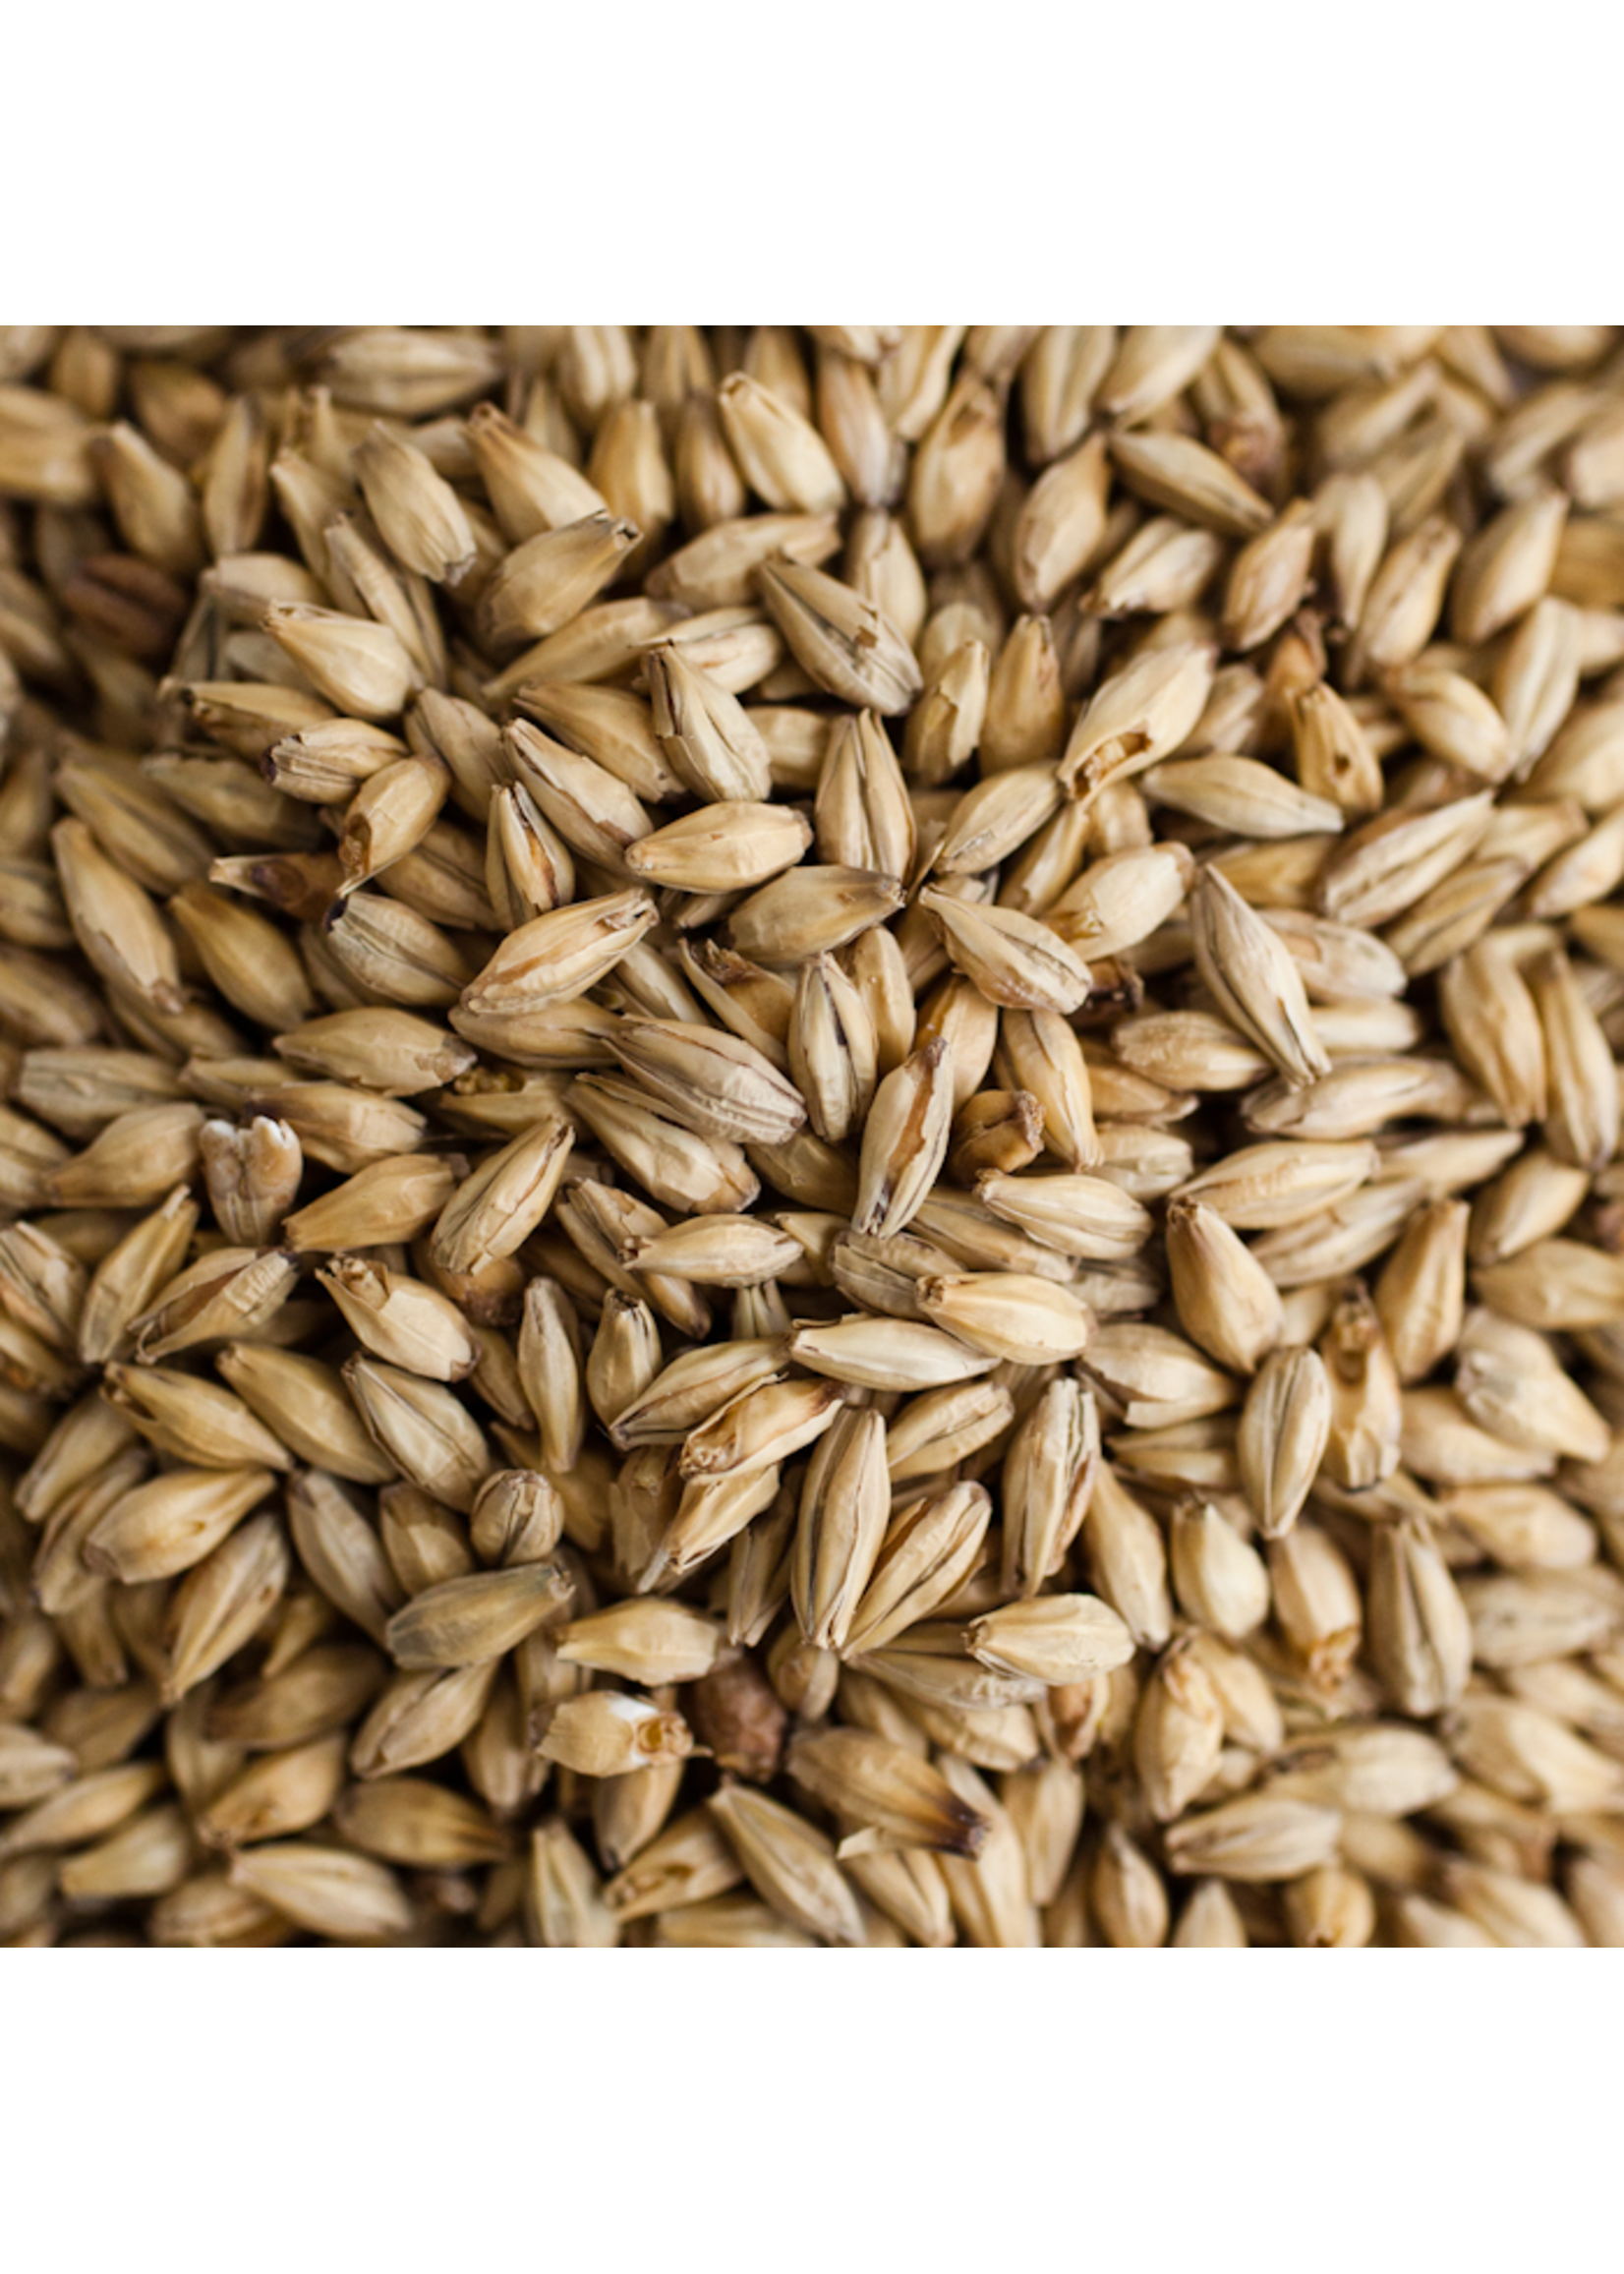 Grain Avangard Malz Premium 2-Row Malt - 55 LB